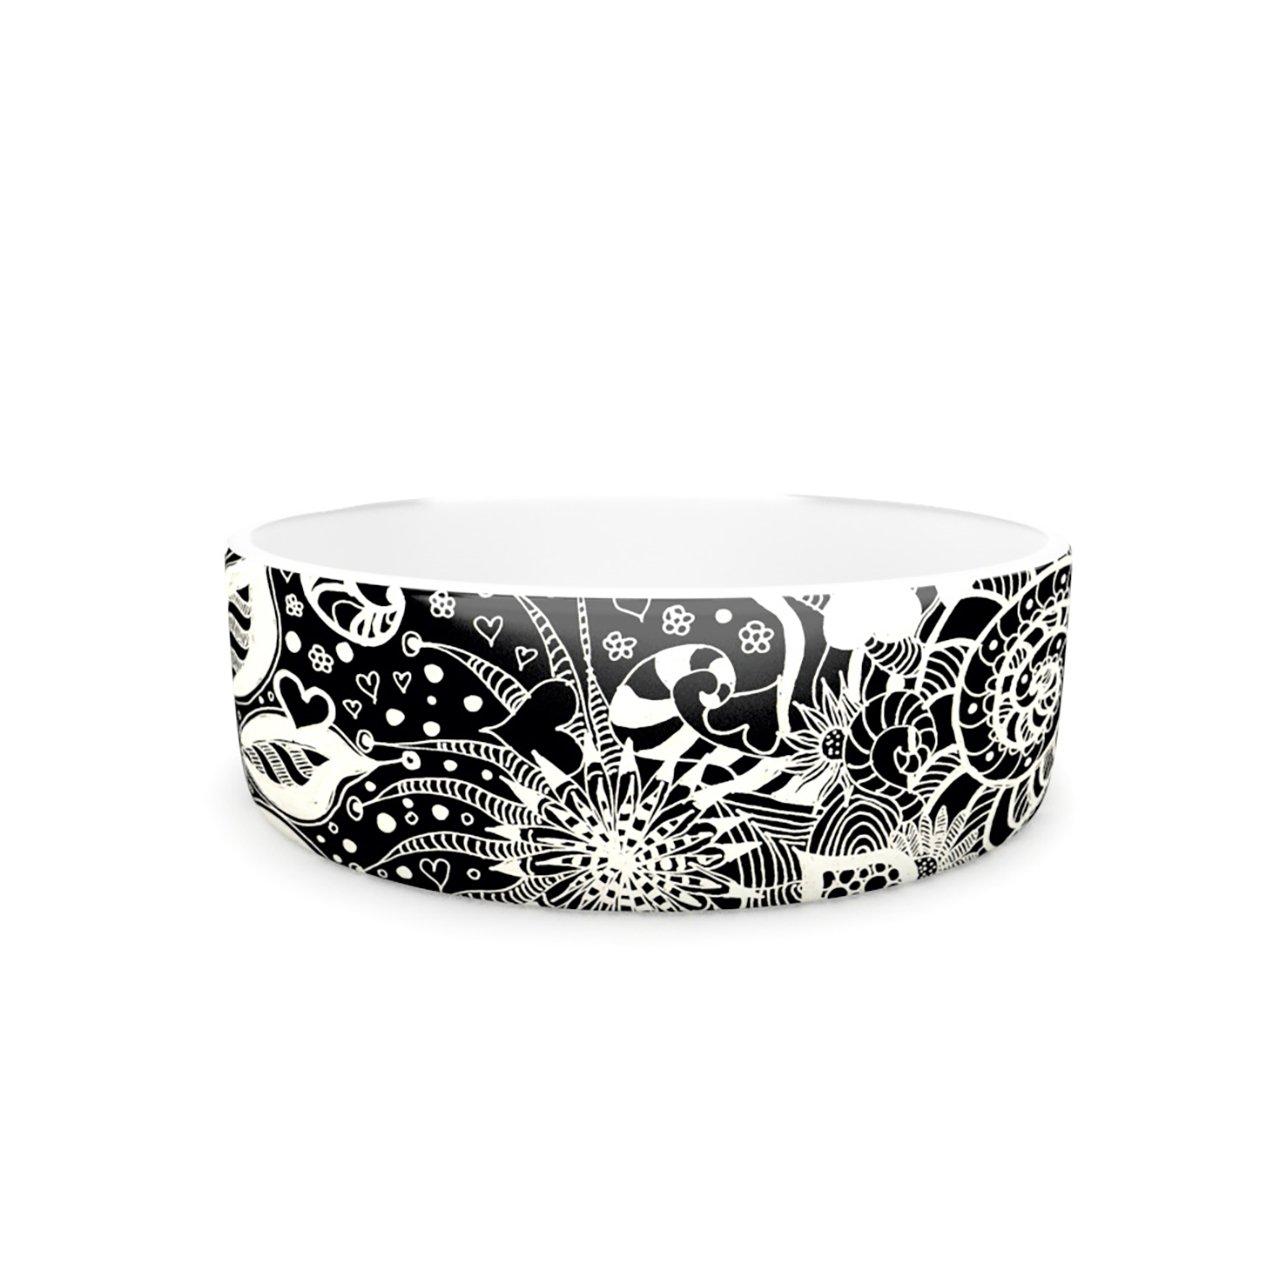 Kess InHouse Monika Strigel Neptunes Garden  Pet Bowl, 7-Inch